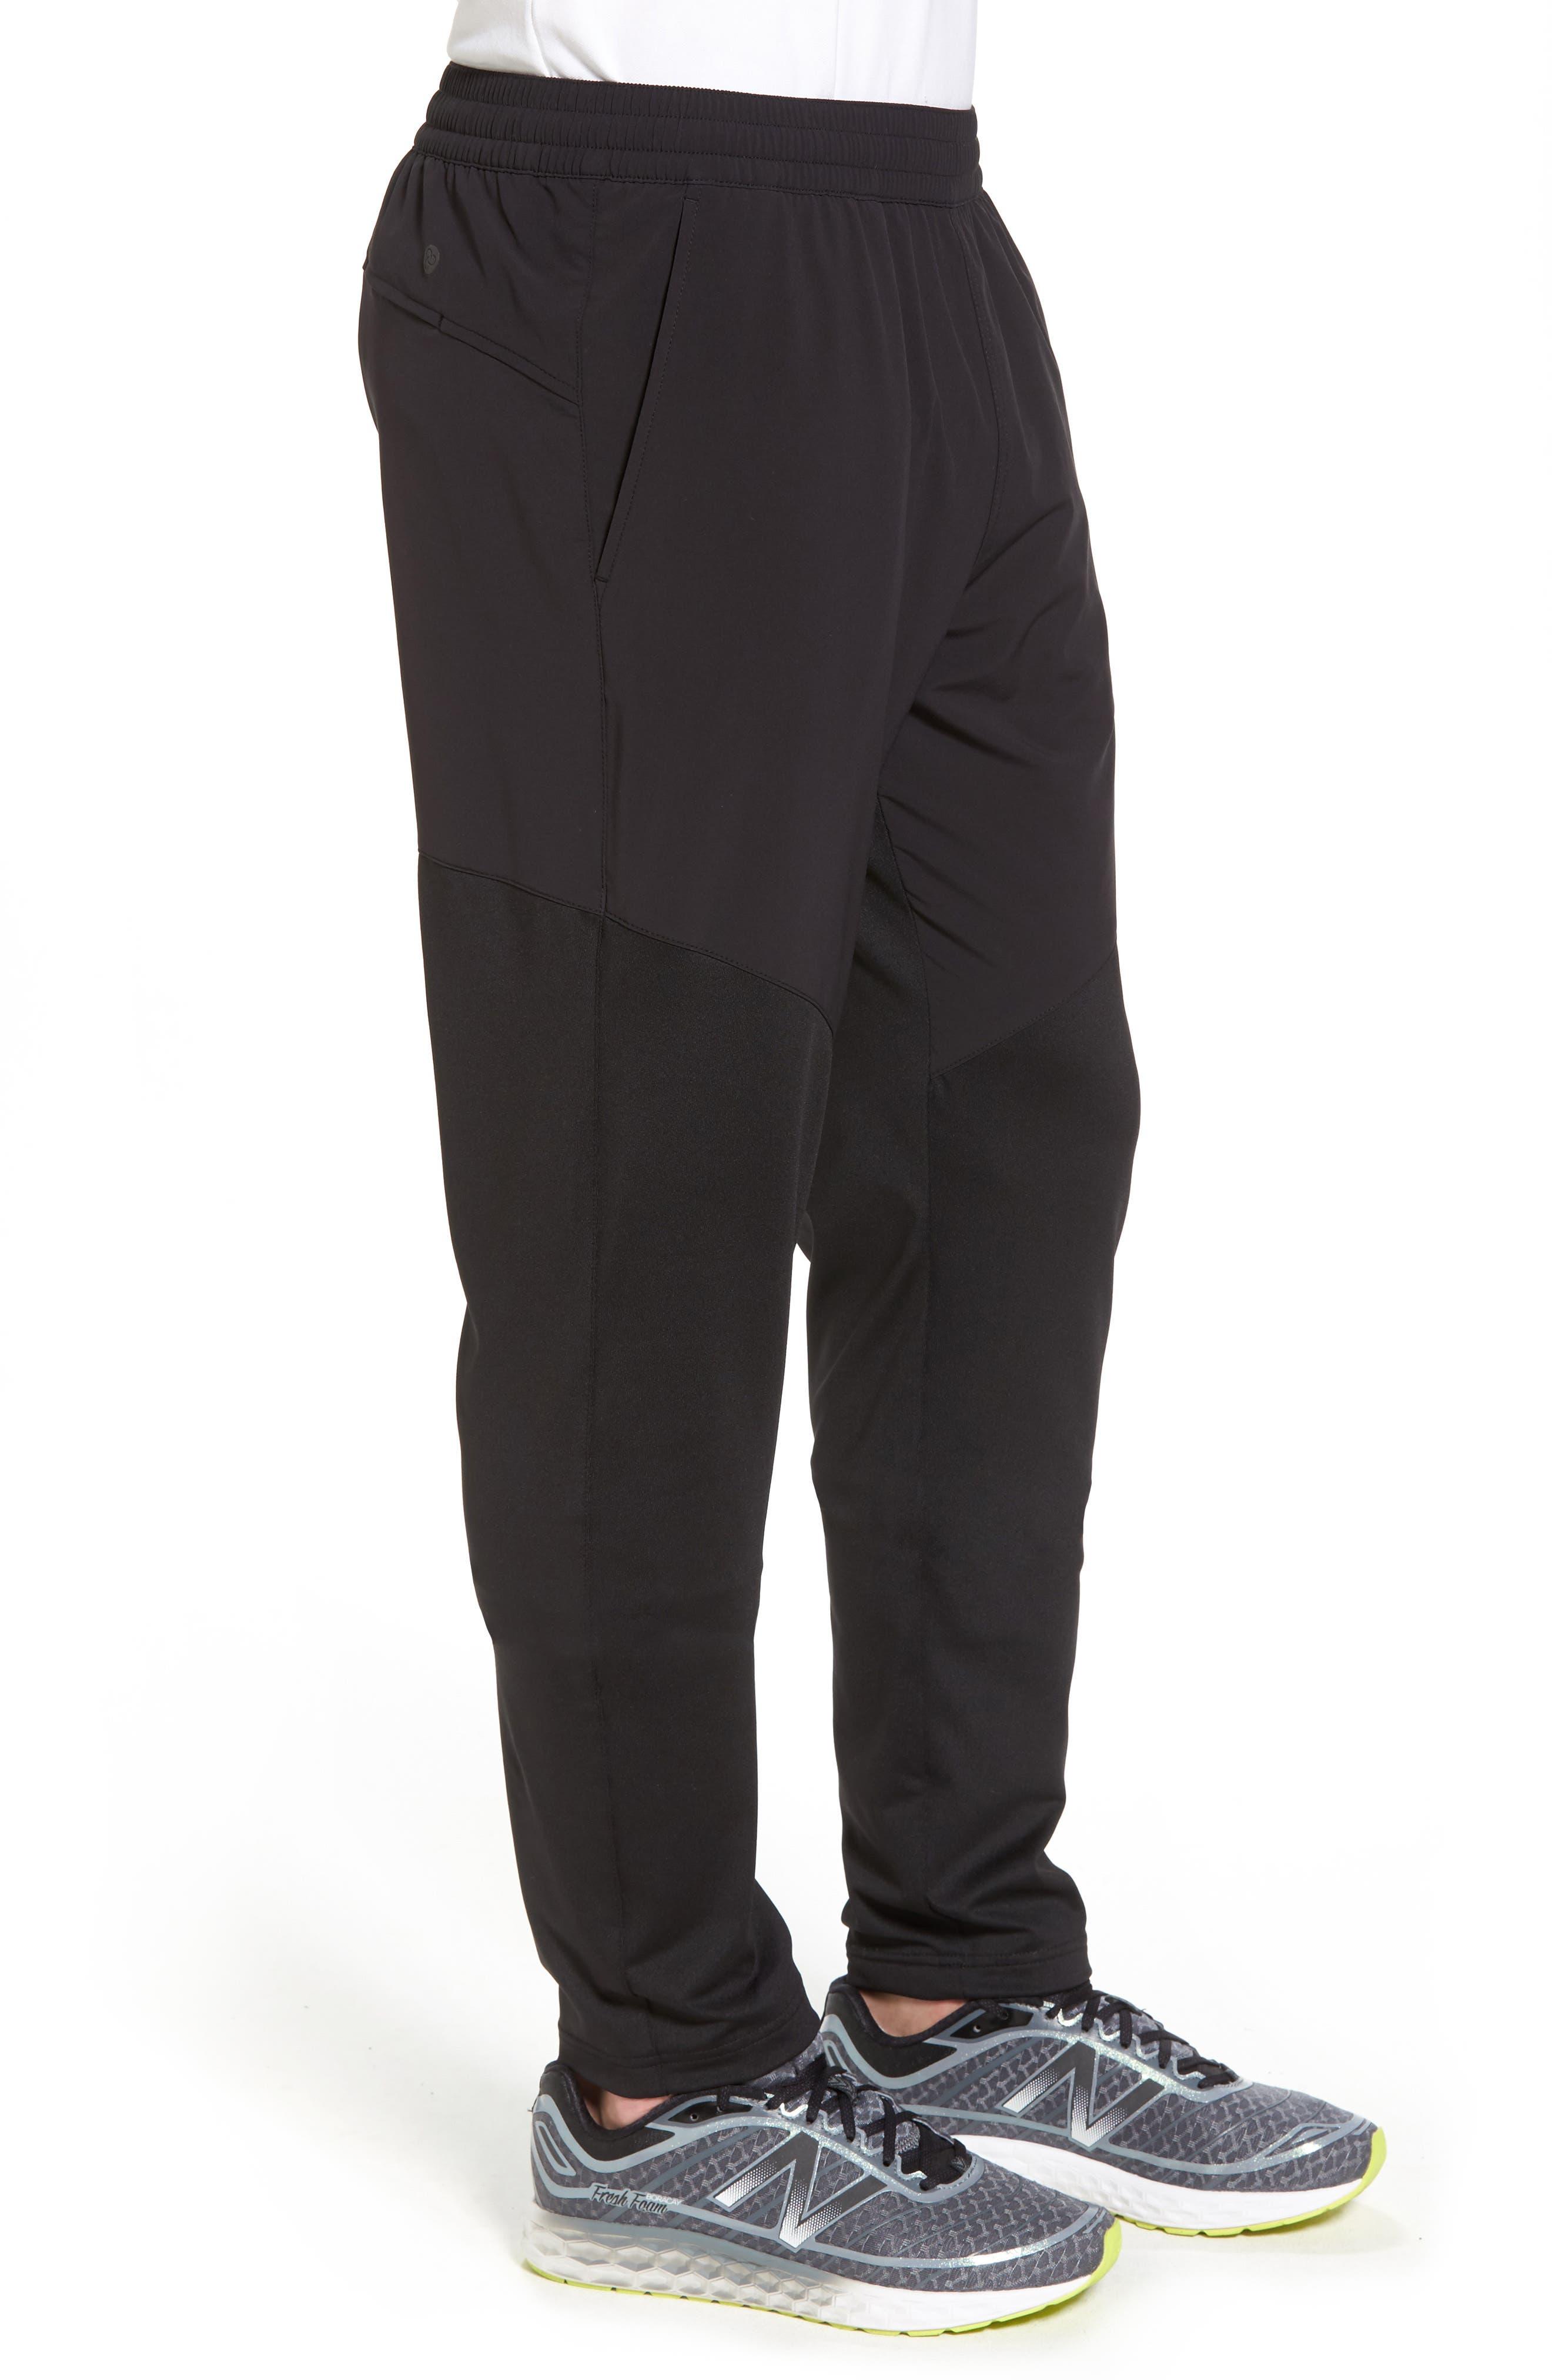 Graphite Tapered Athletic Pants,                             Alternate thumbnail 3, color,                             Black